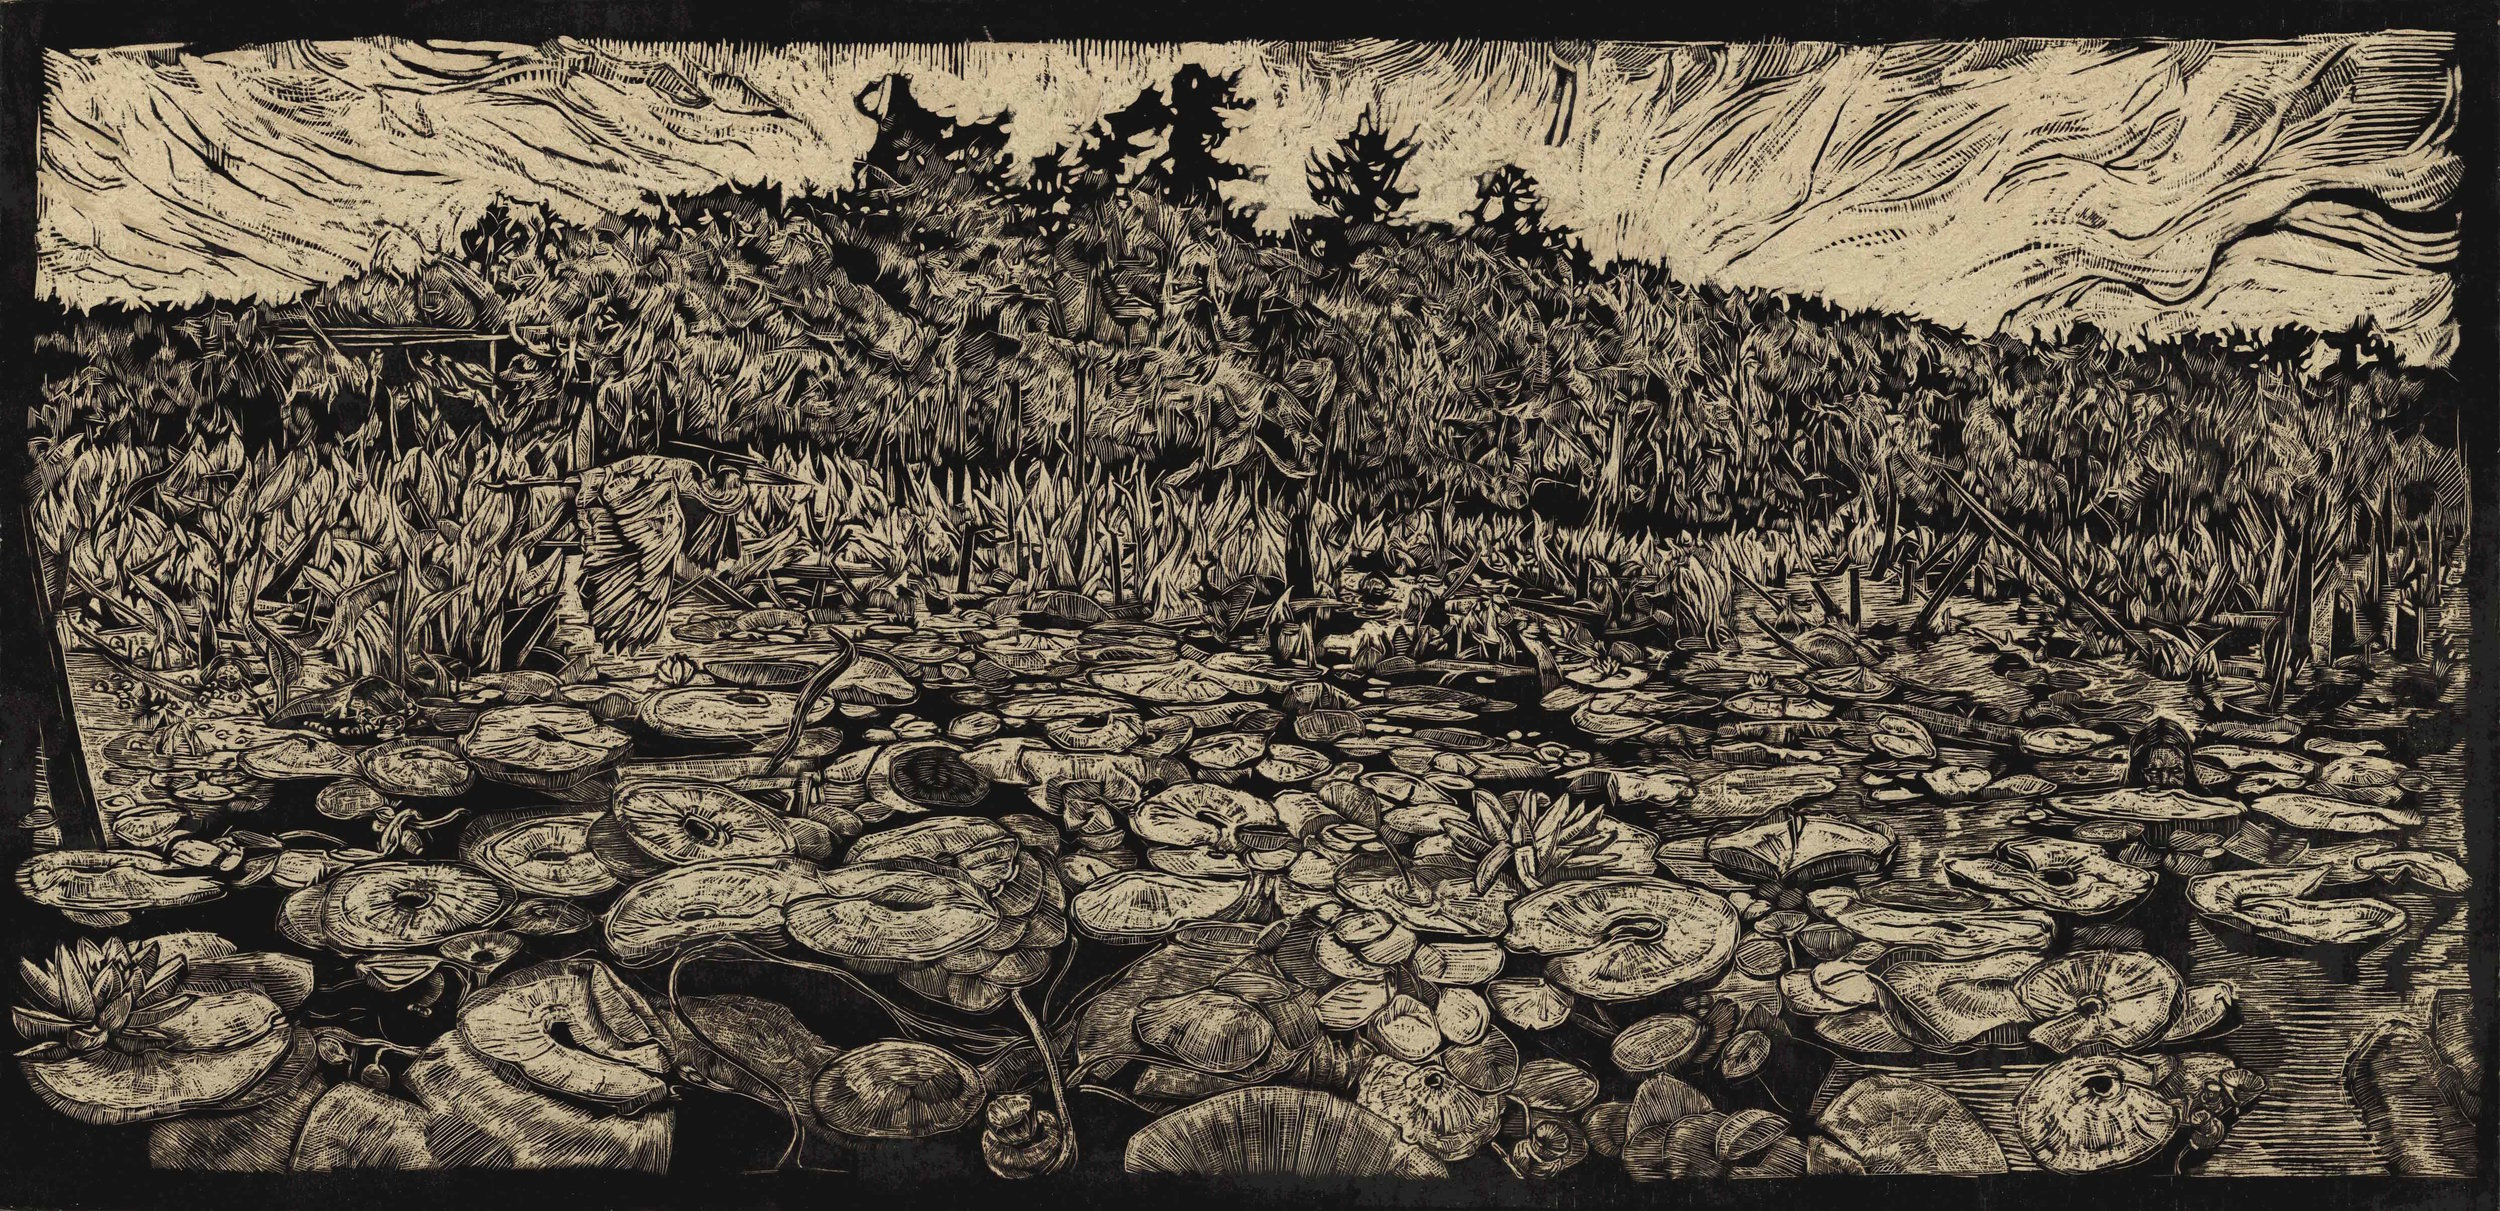 Watie White -  Holy Island: The Nokken,  2017  Omaha, NE   Winner - Best Printmaking